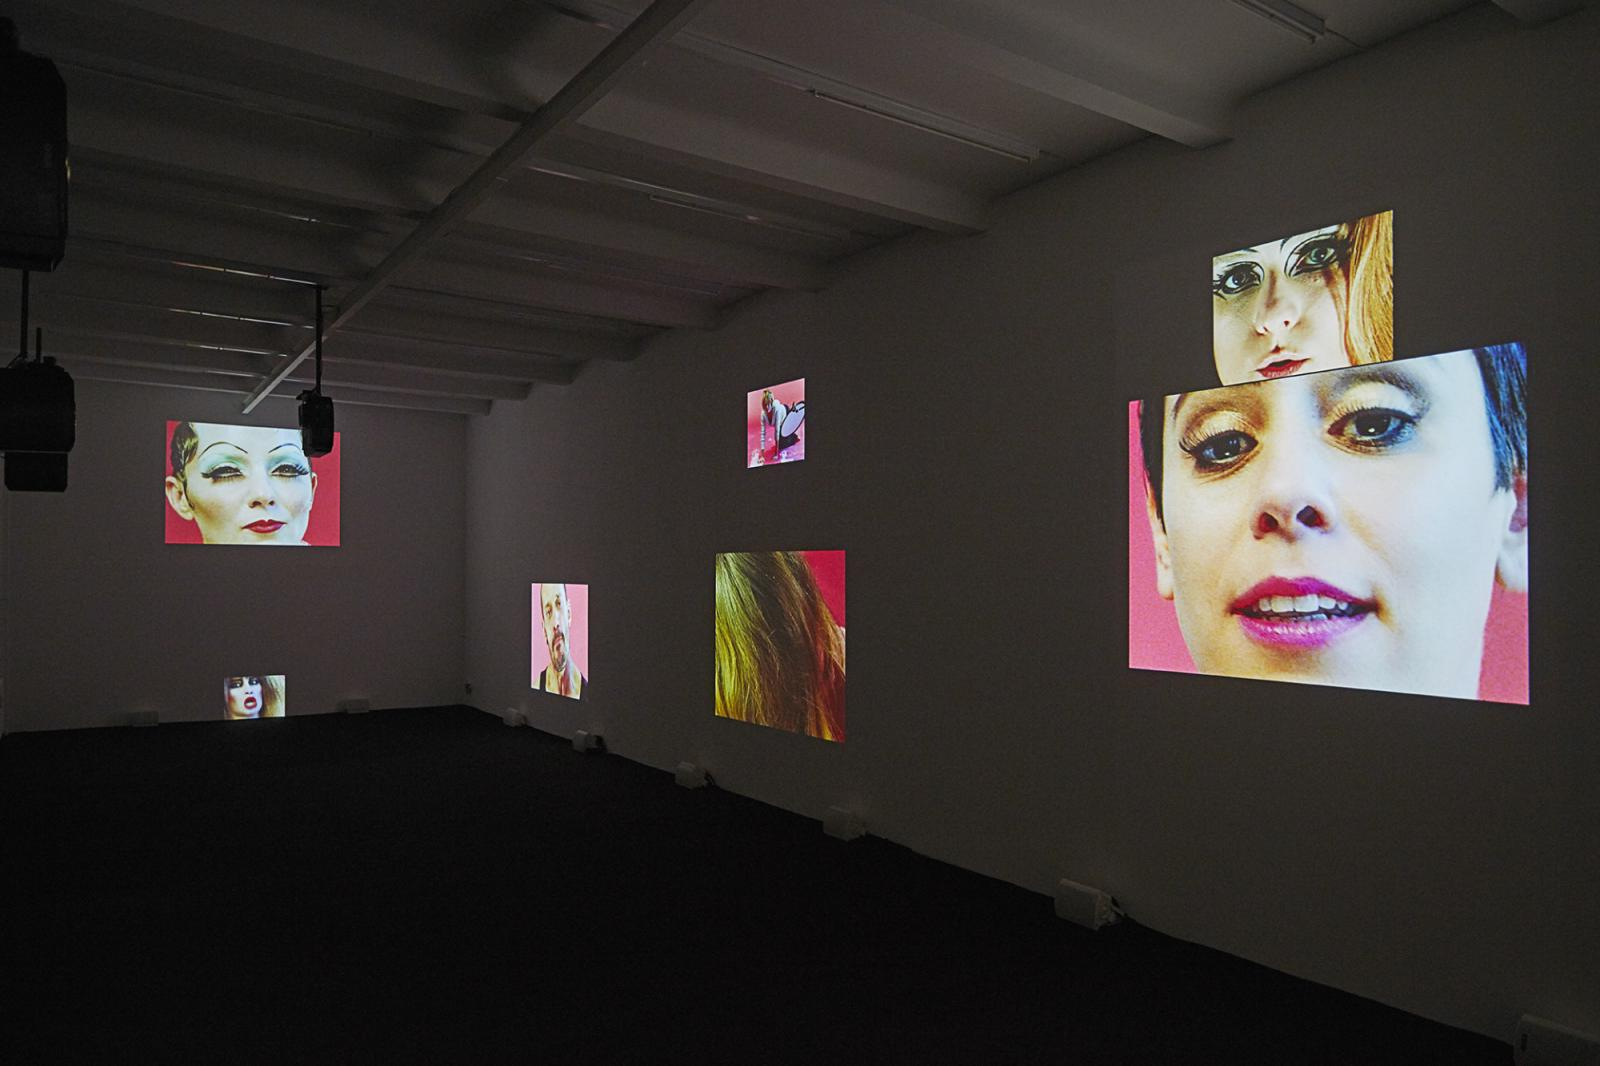 Dara Friedman /Dichter/(2016) installation view at Supportico Lopez